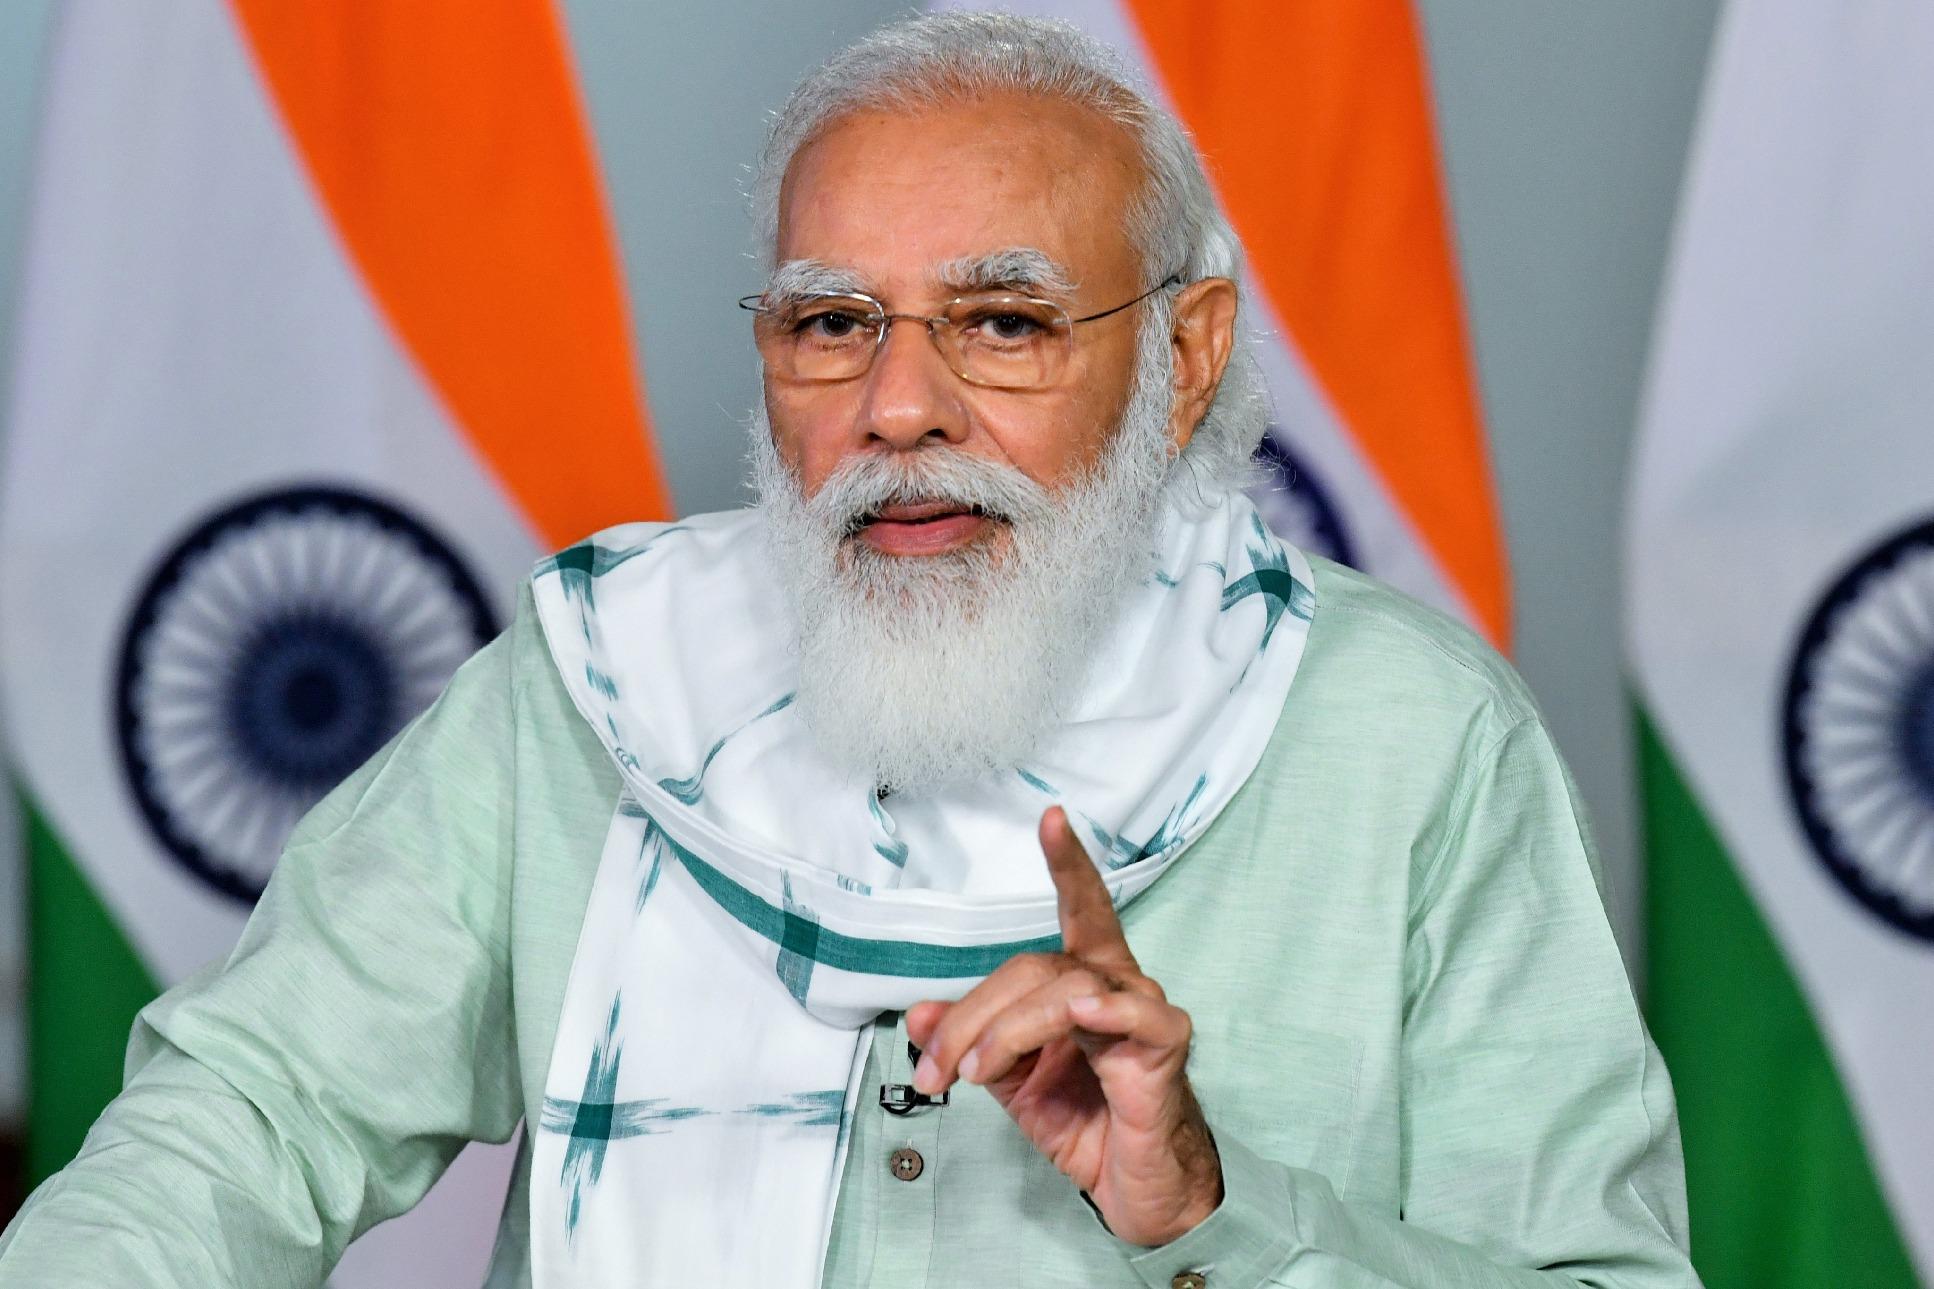 PM Modi inaugurates Bengaluru Tech Summit